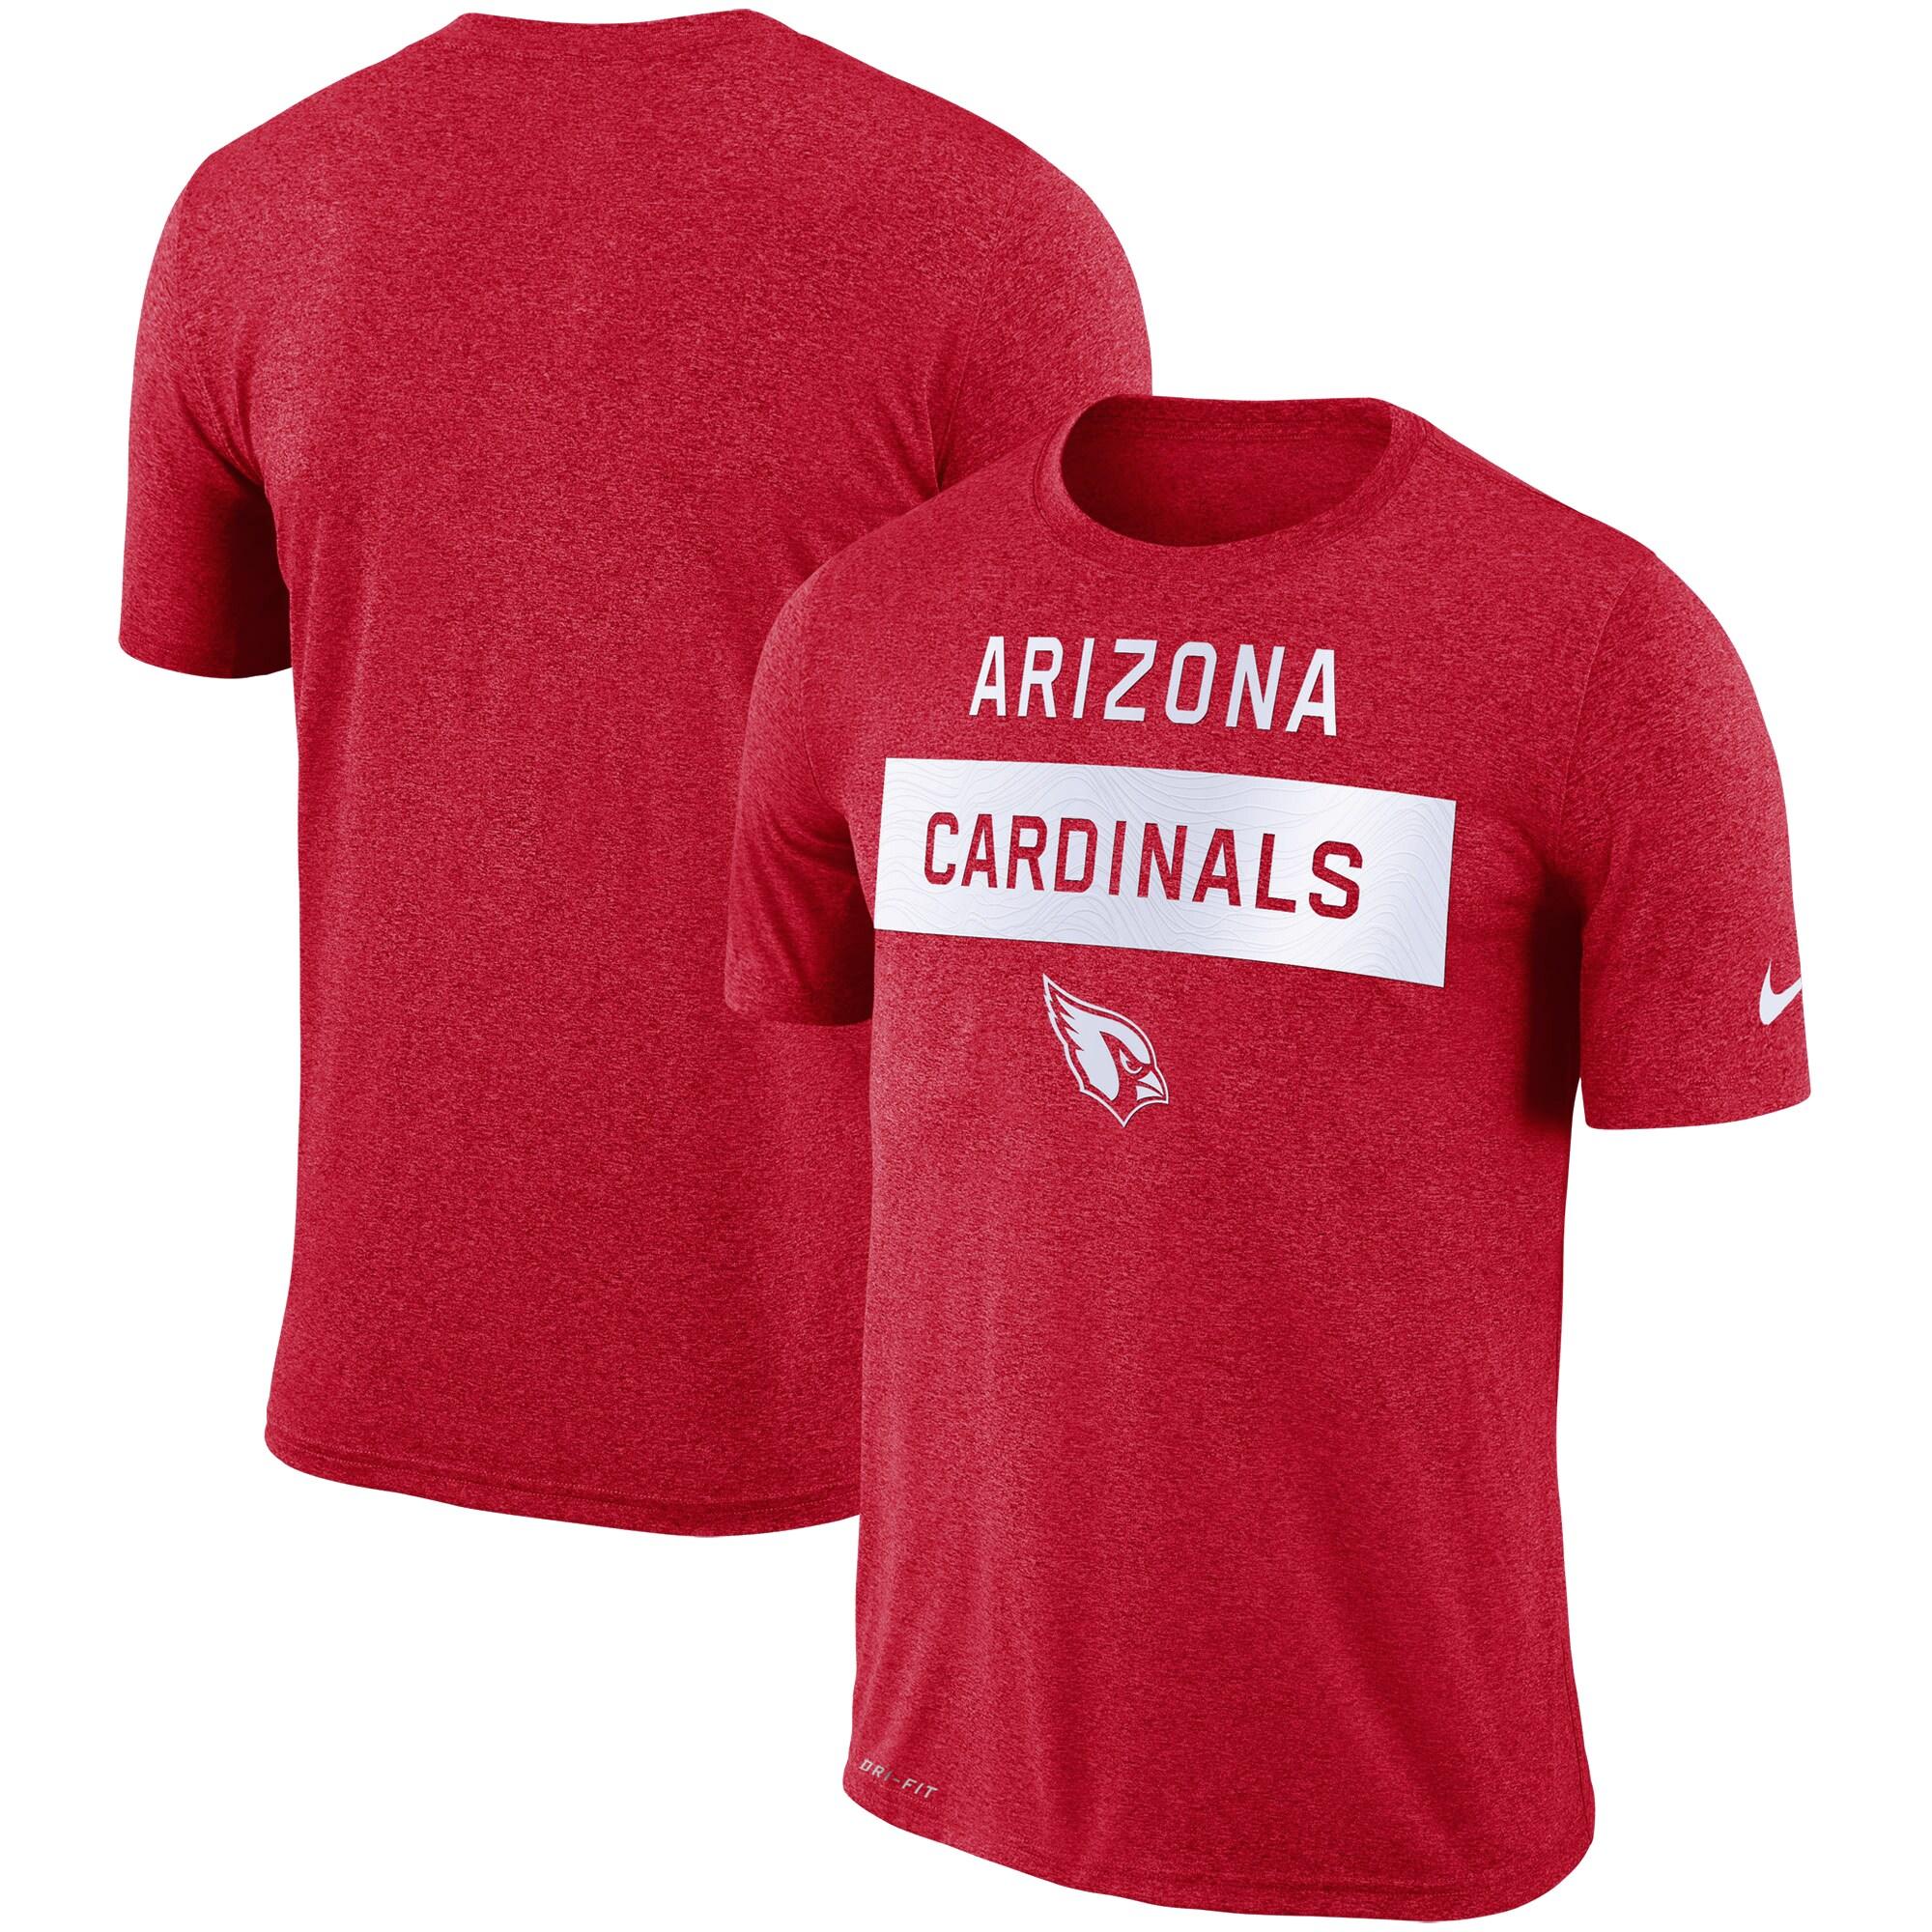 Arizona Cardinals Nike Sideline Legend Lift Performance T-Shirt - Cardinal